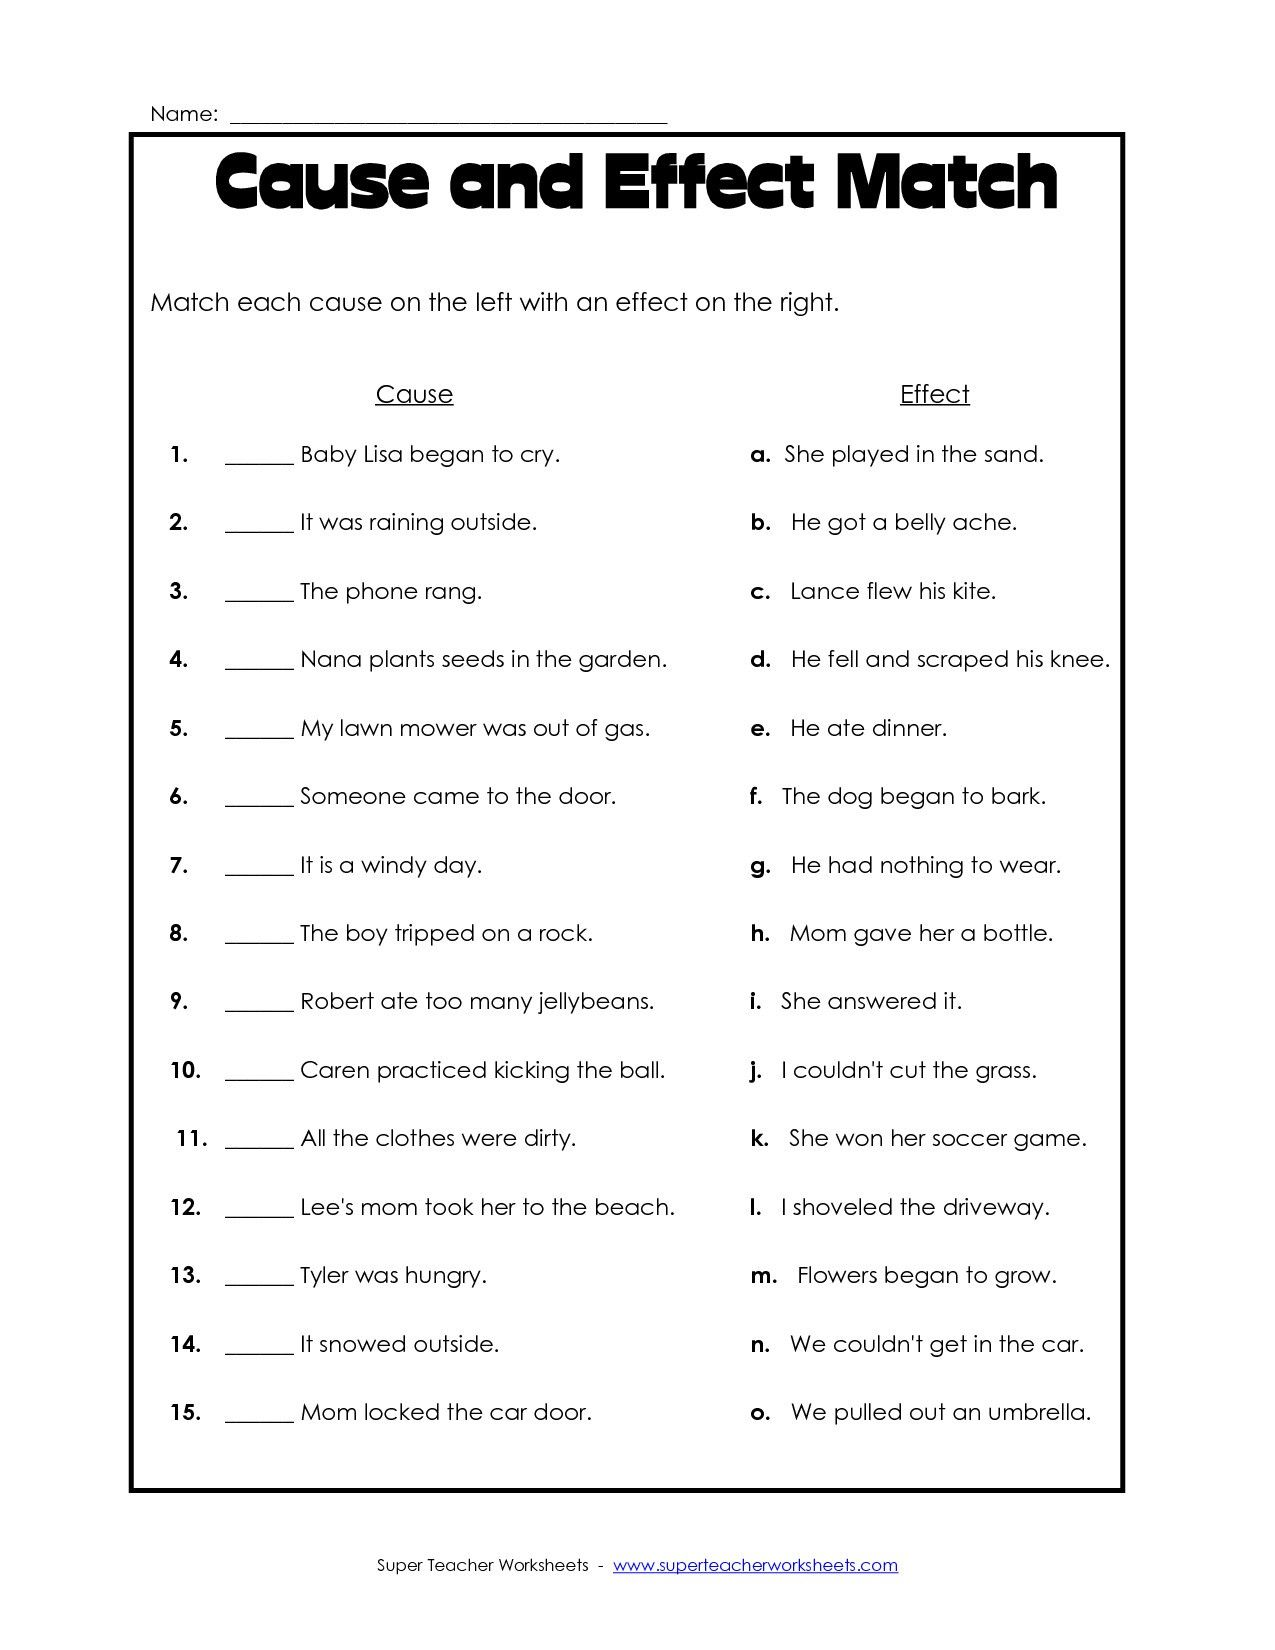 Free 1St Grade Social Studies Worksheets Pictures - 1st ...